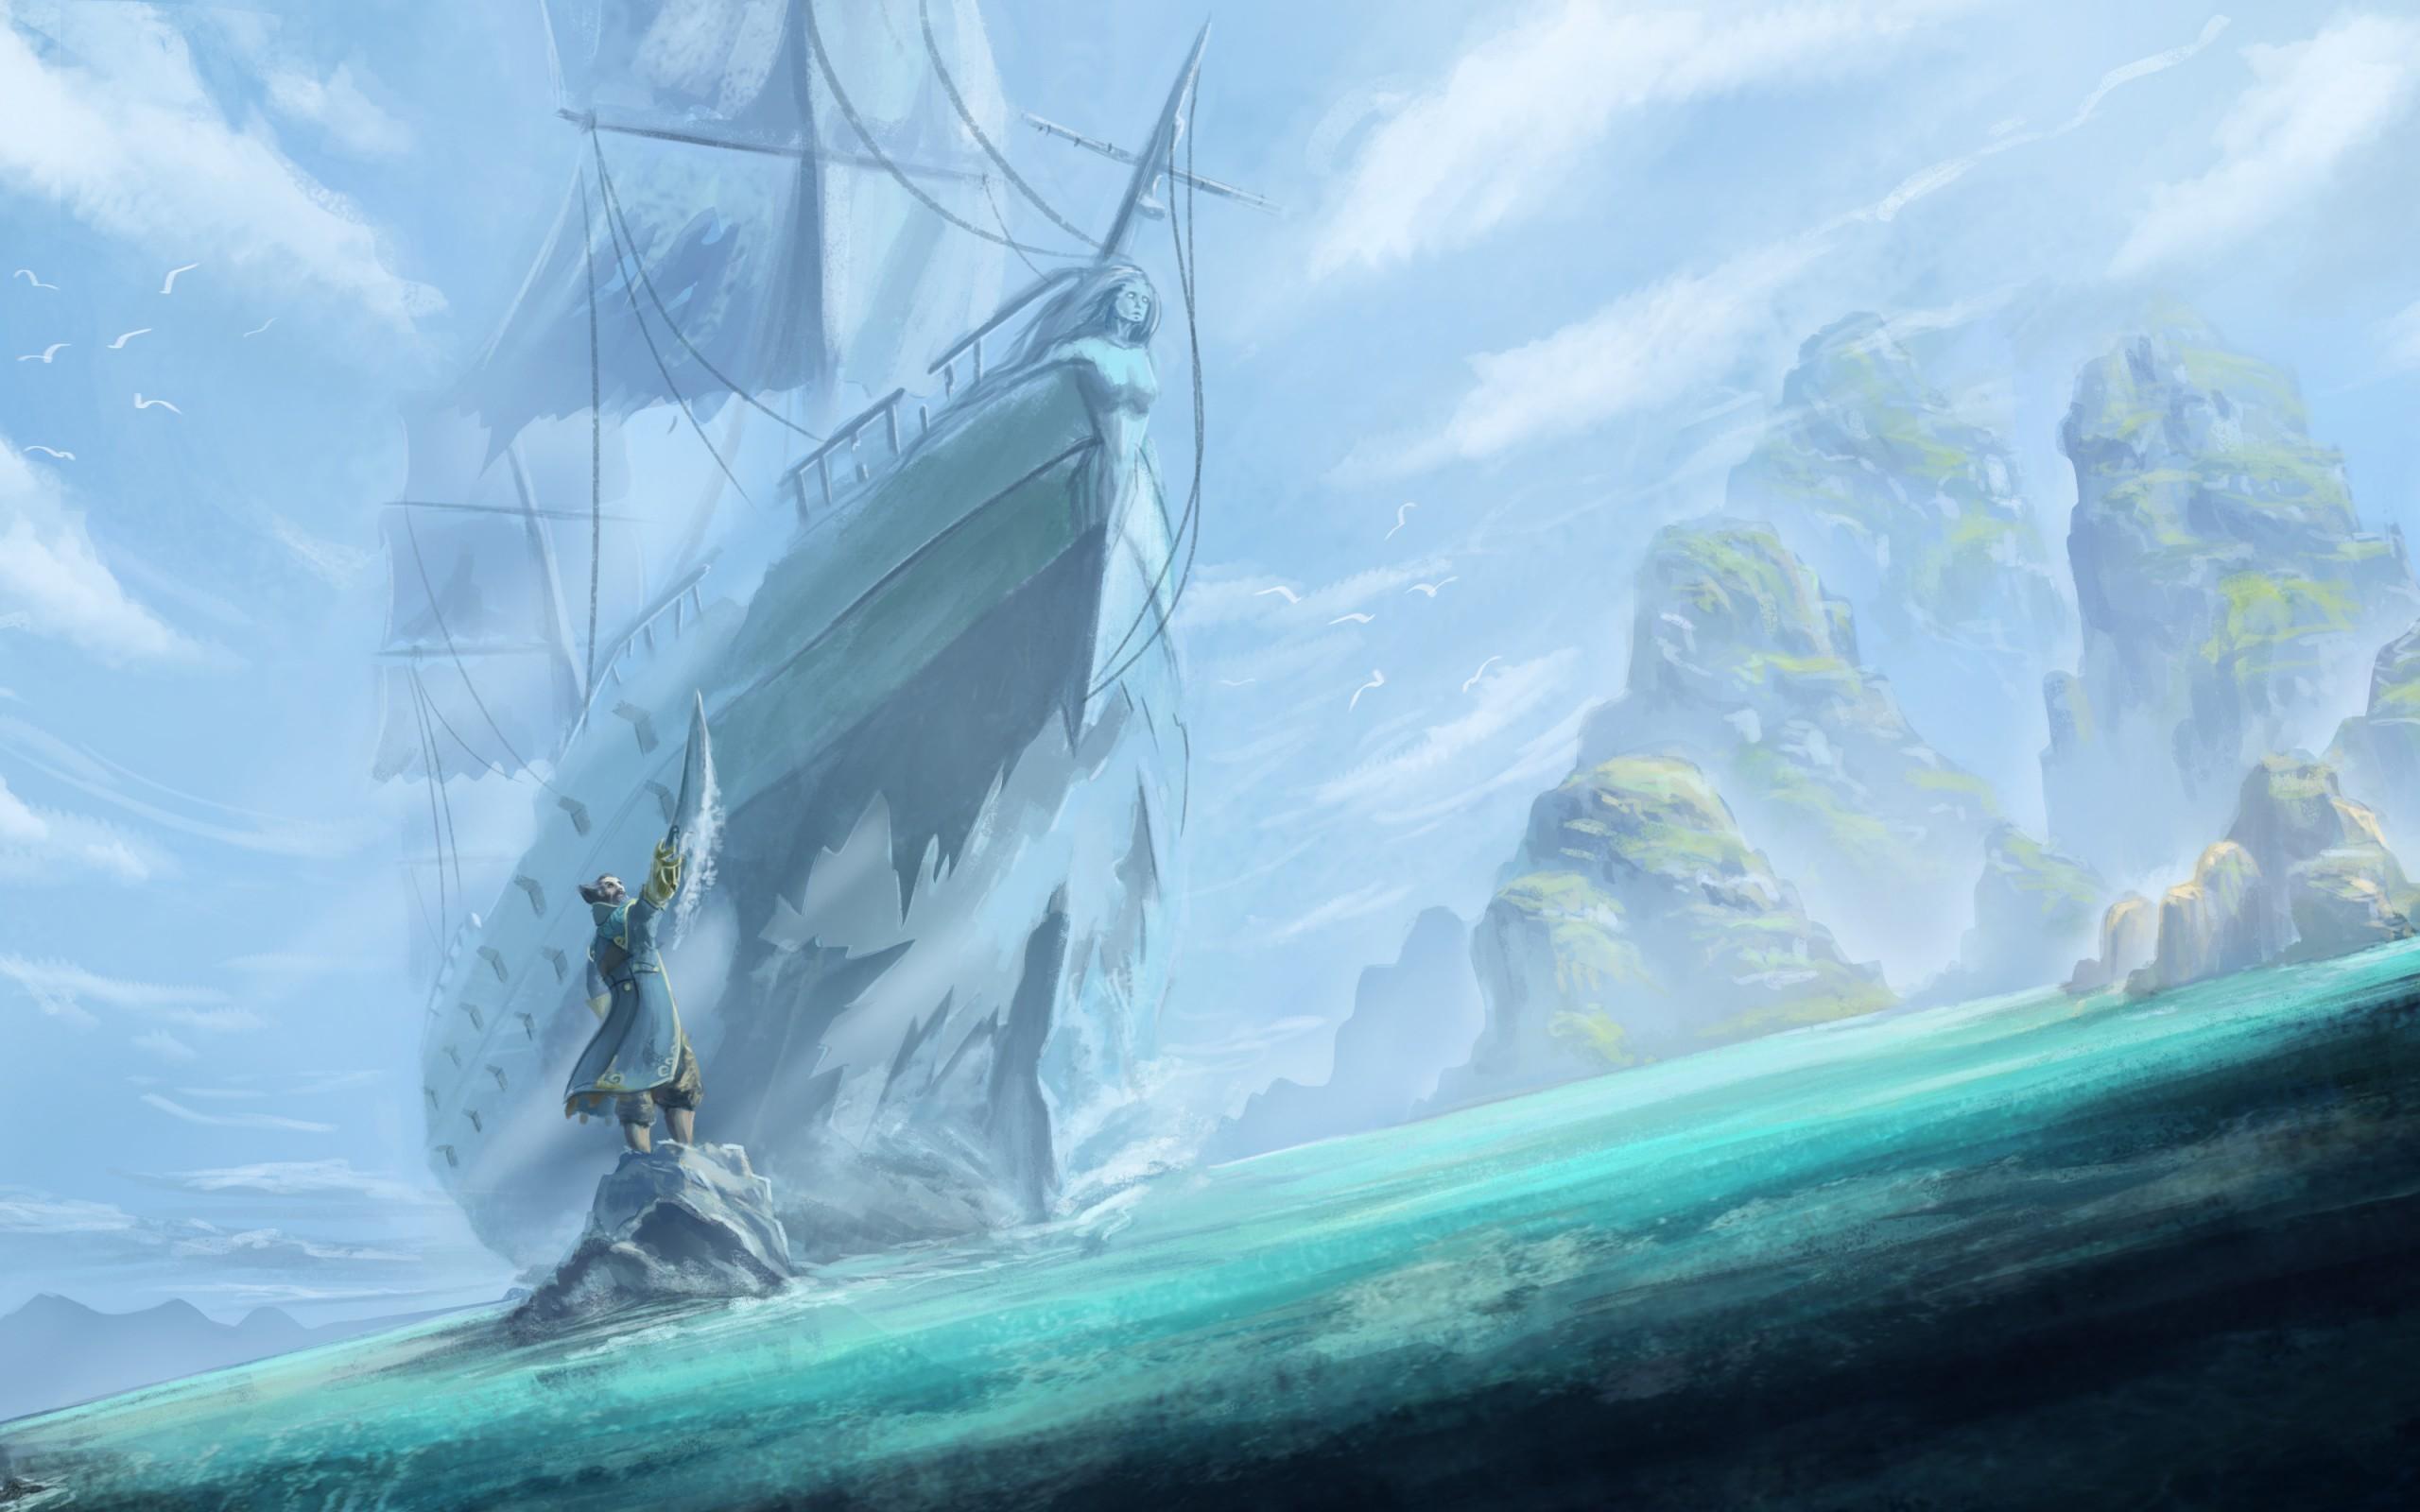 General 2560x1600 fantasy art Dota 2 video games ship sea Kunkka